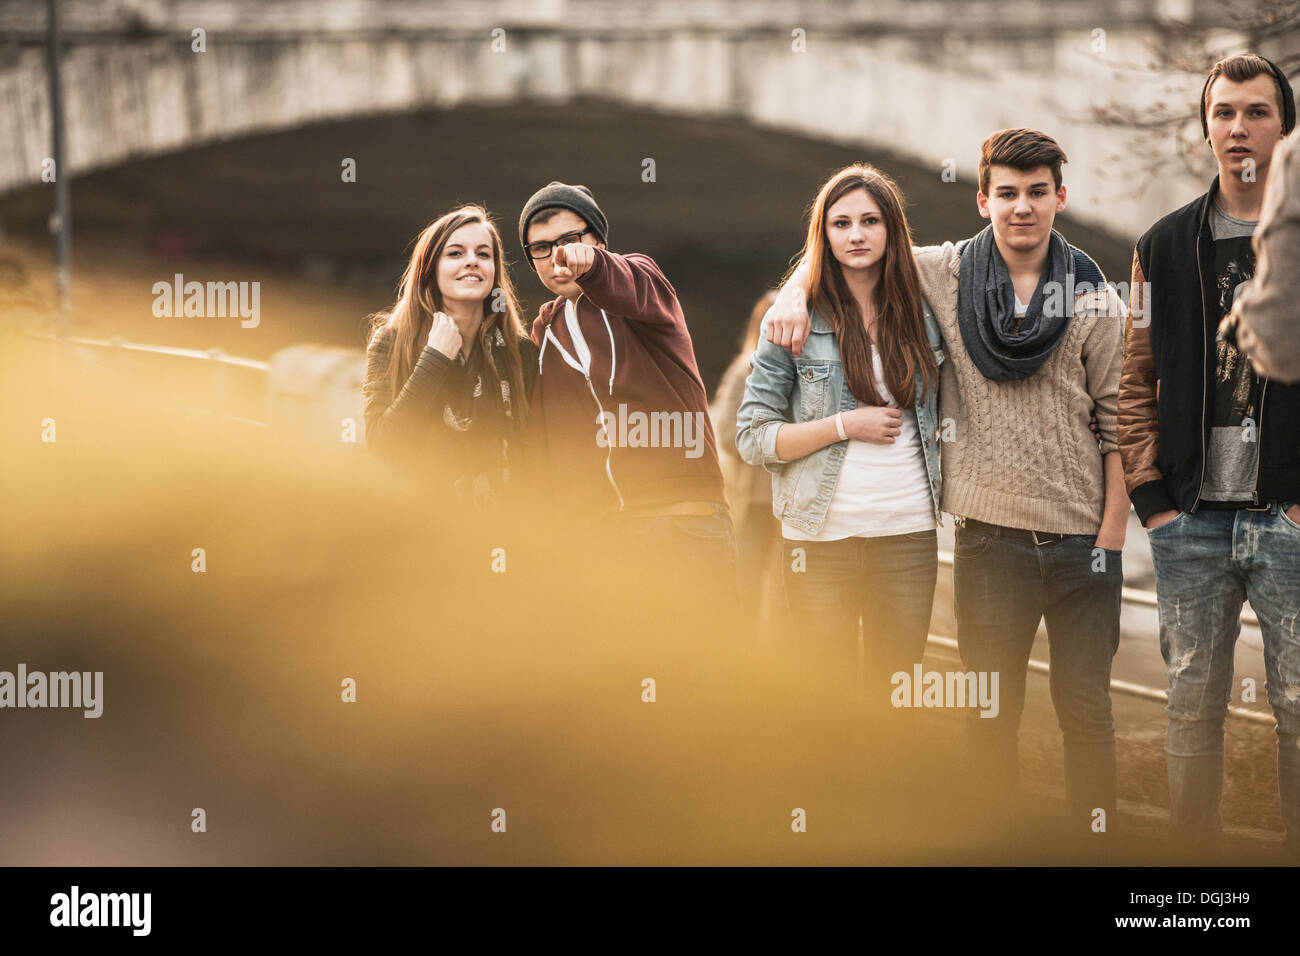 Cinq adolescents à l'extérieur, boy pointing at camera Photo Stock